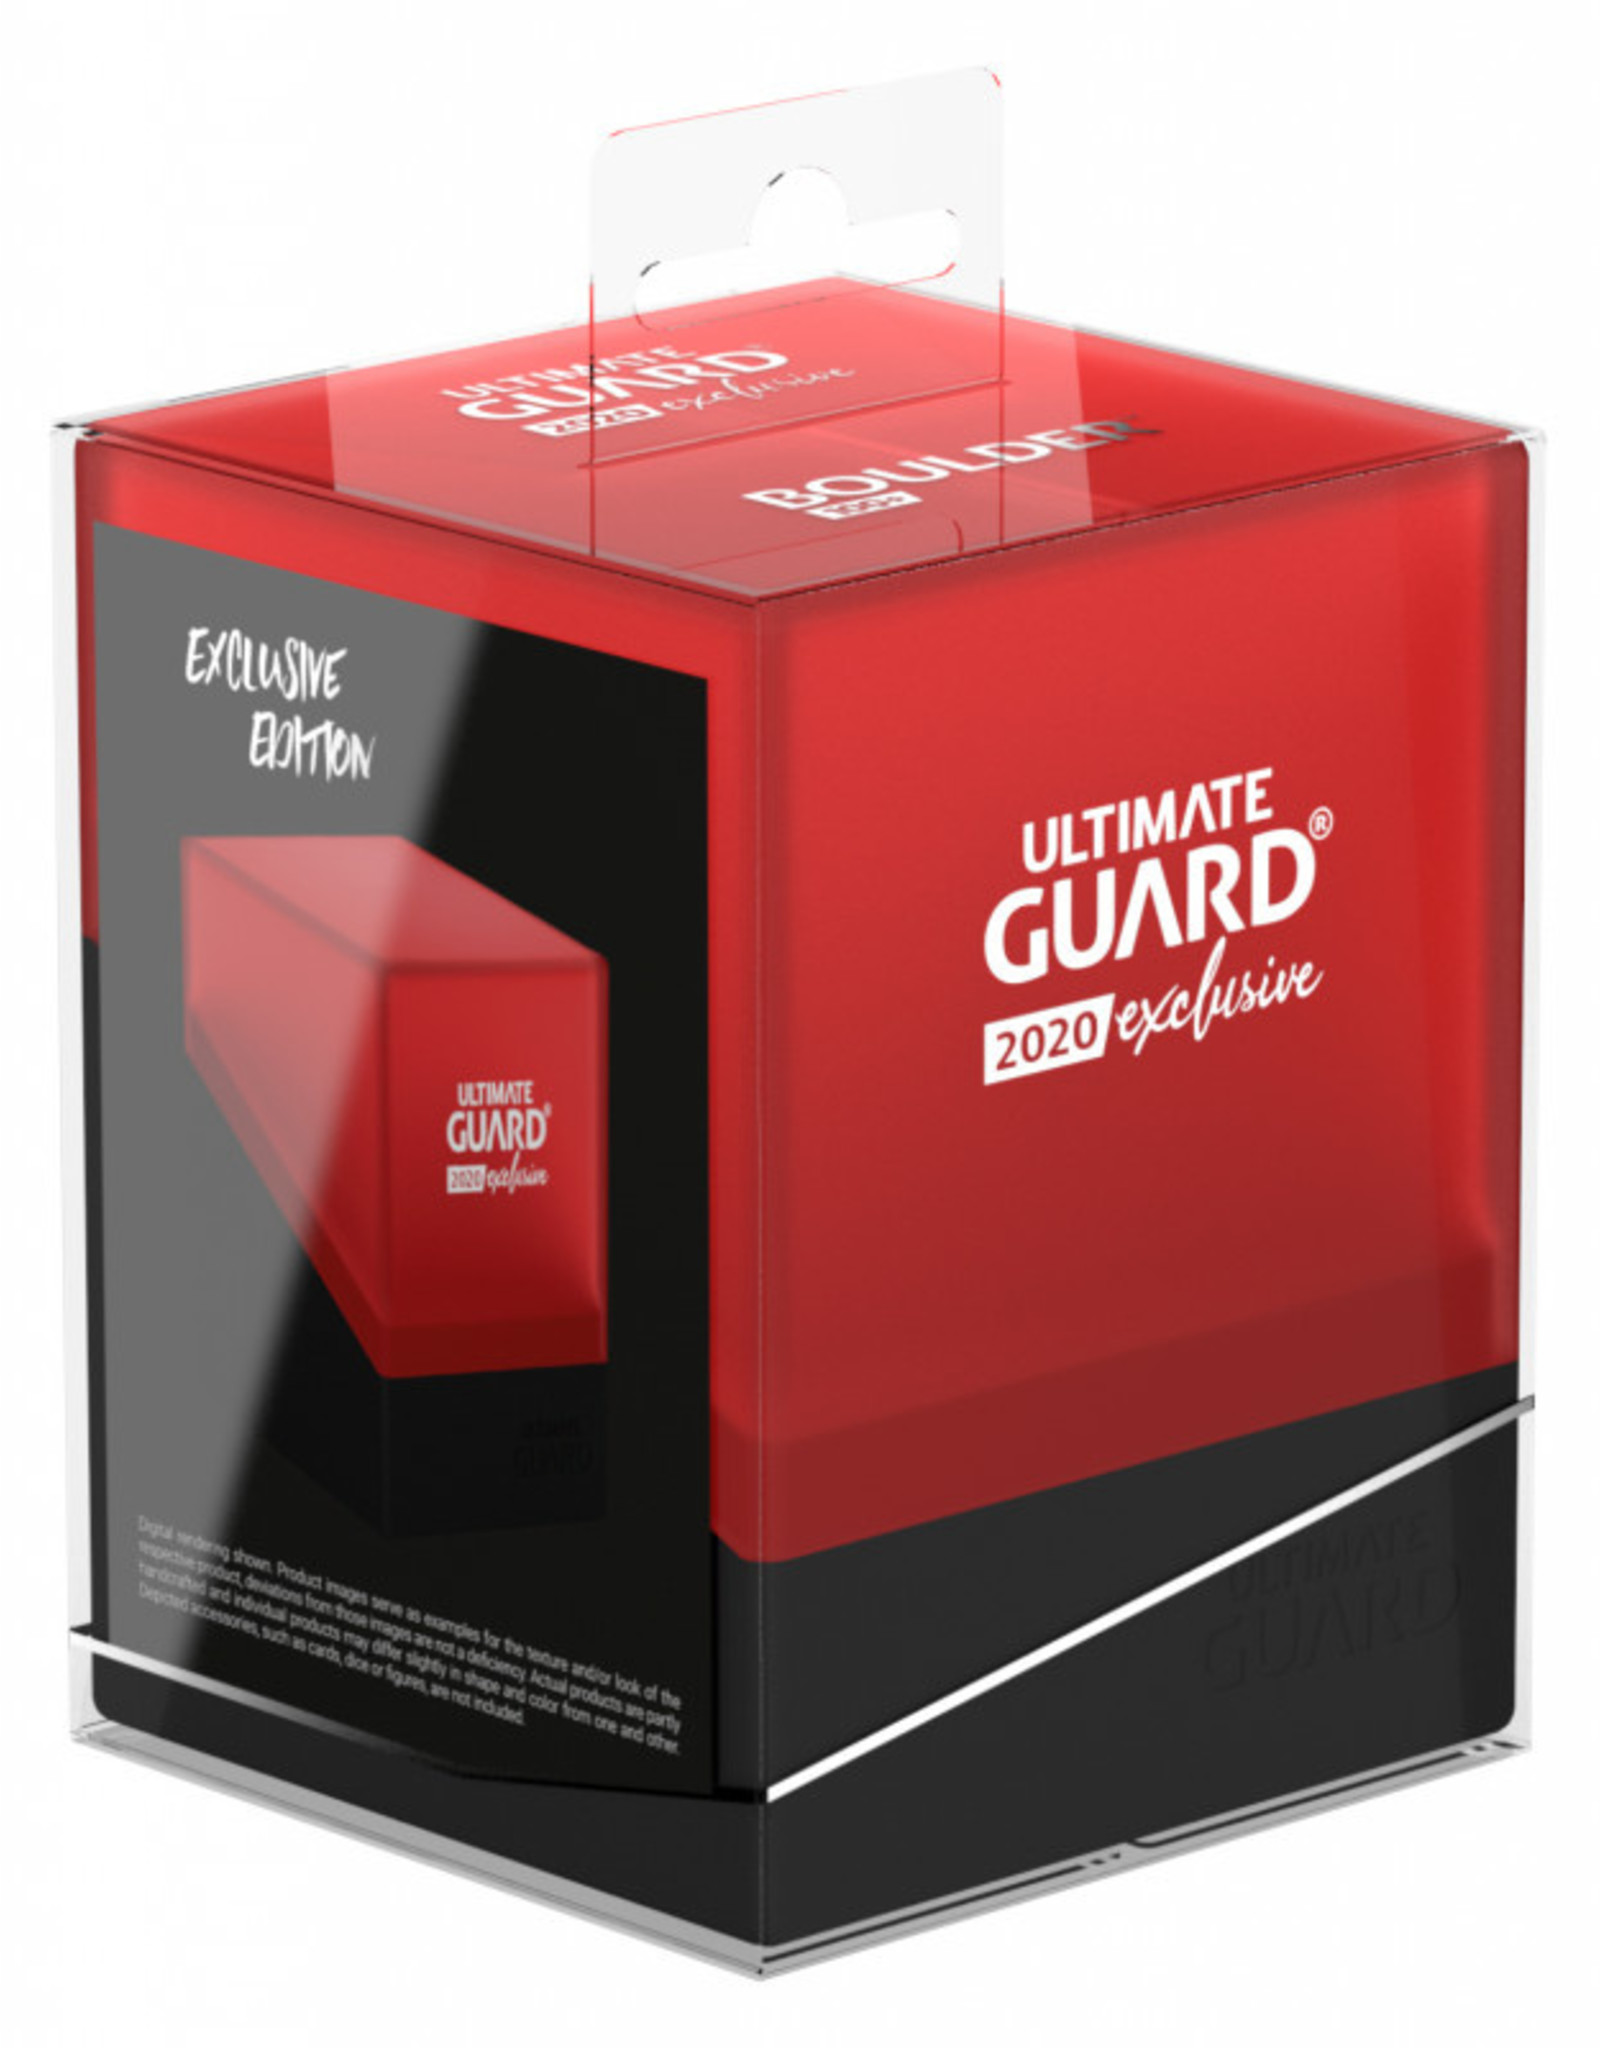 Ultimate Guard Boulder 100+ Black/Red 2020 Exclusive